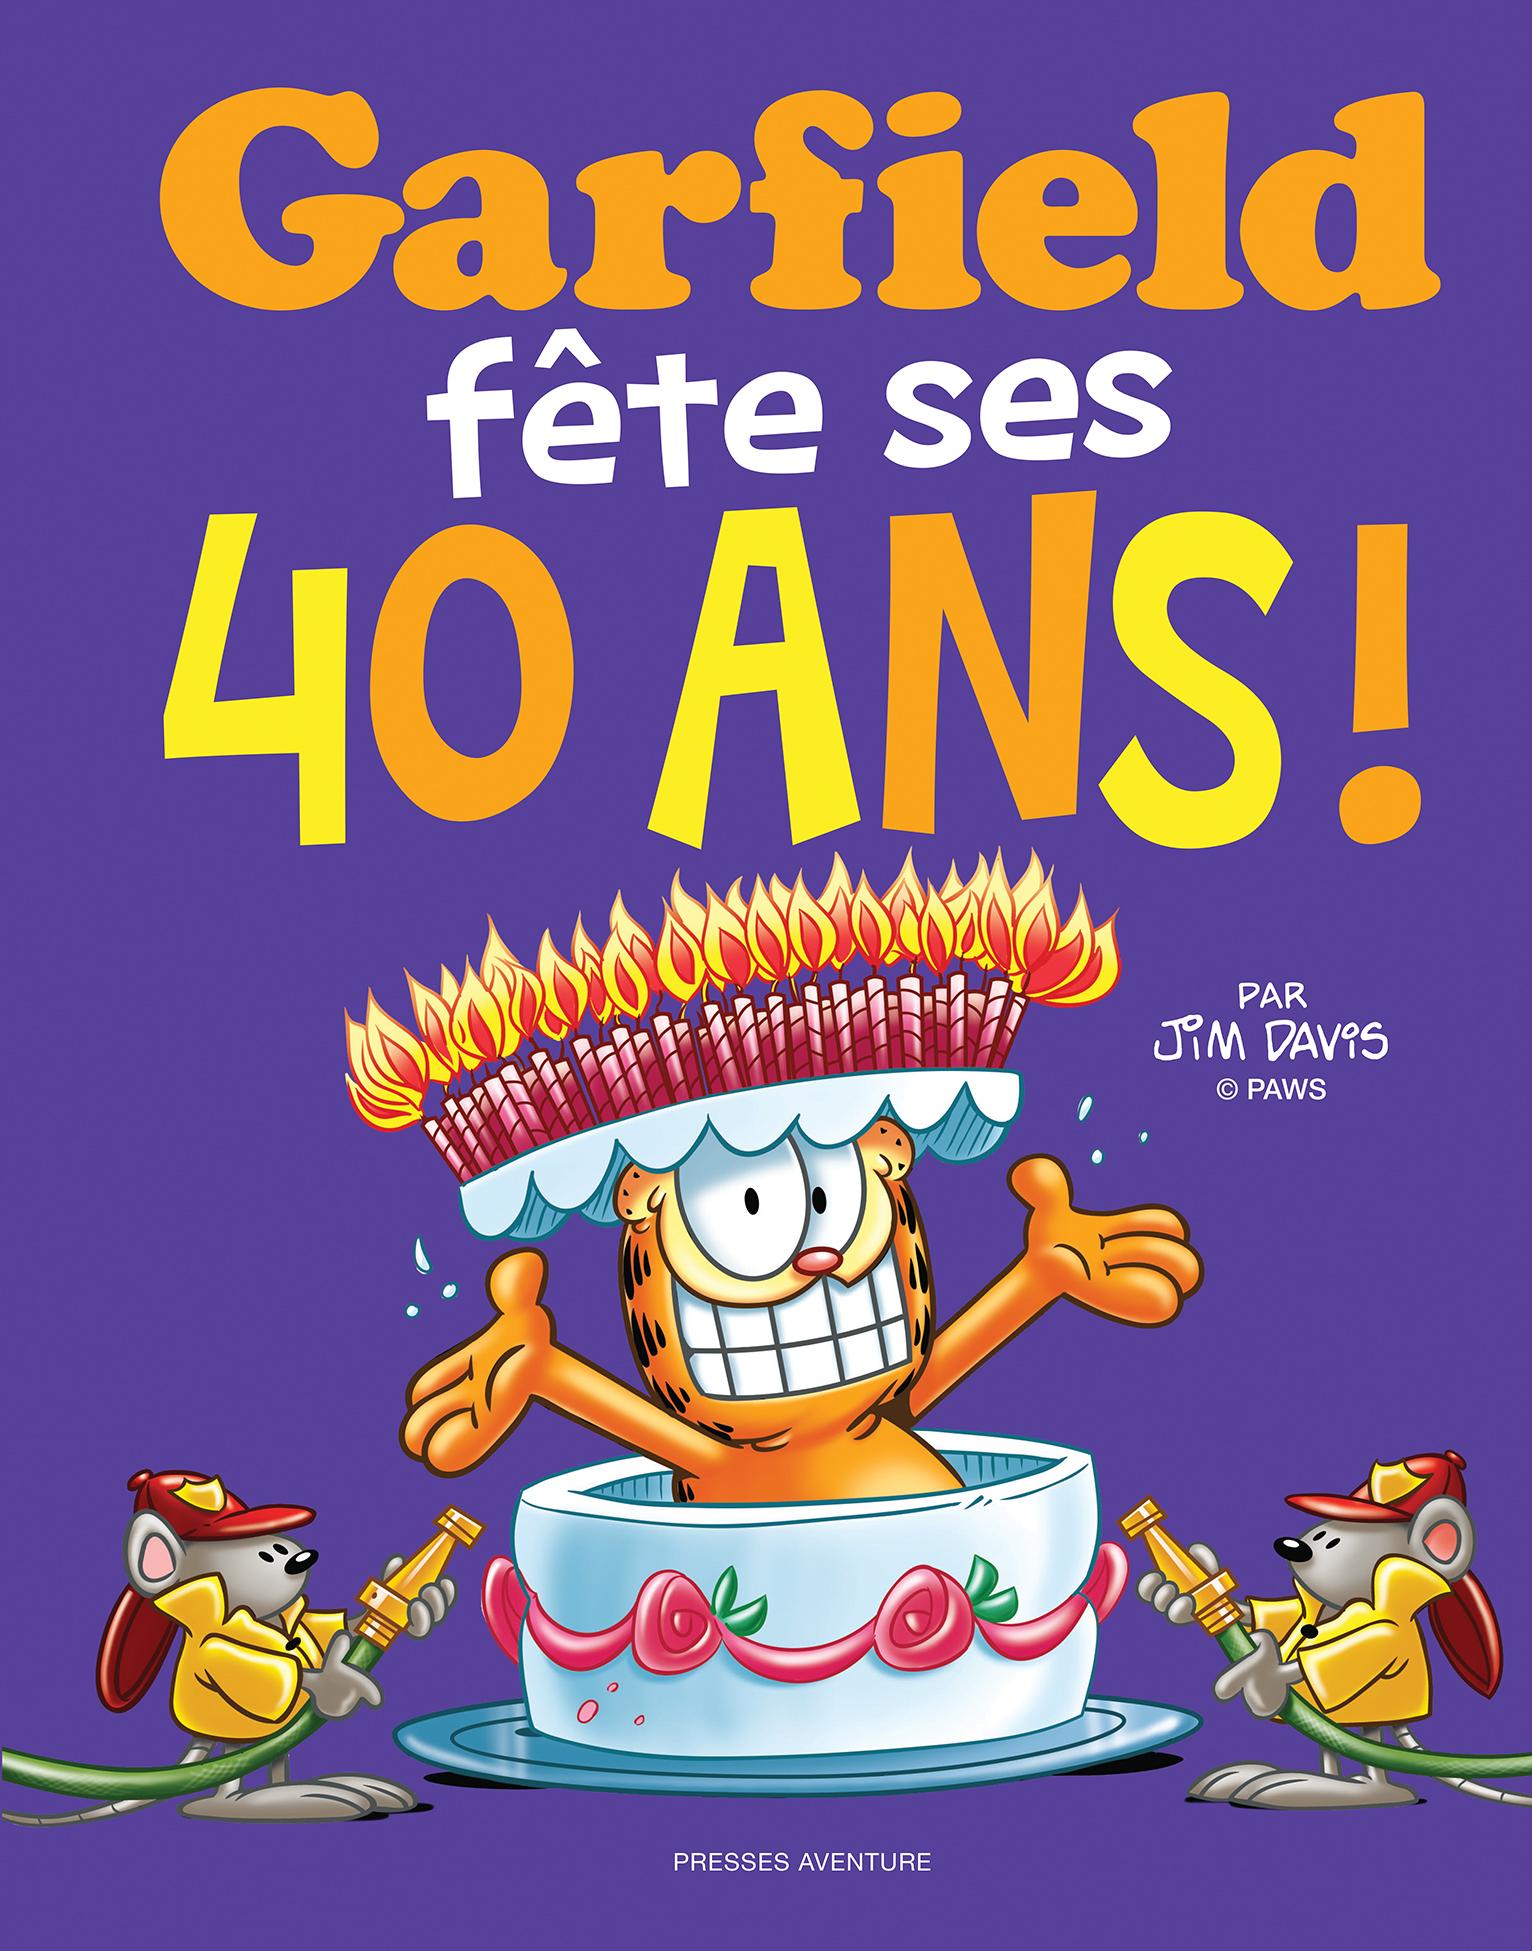 428_GarfieldFeteSes40Ans_C1